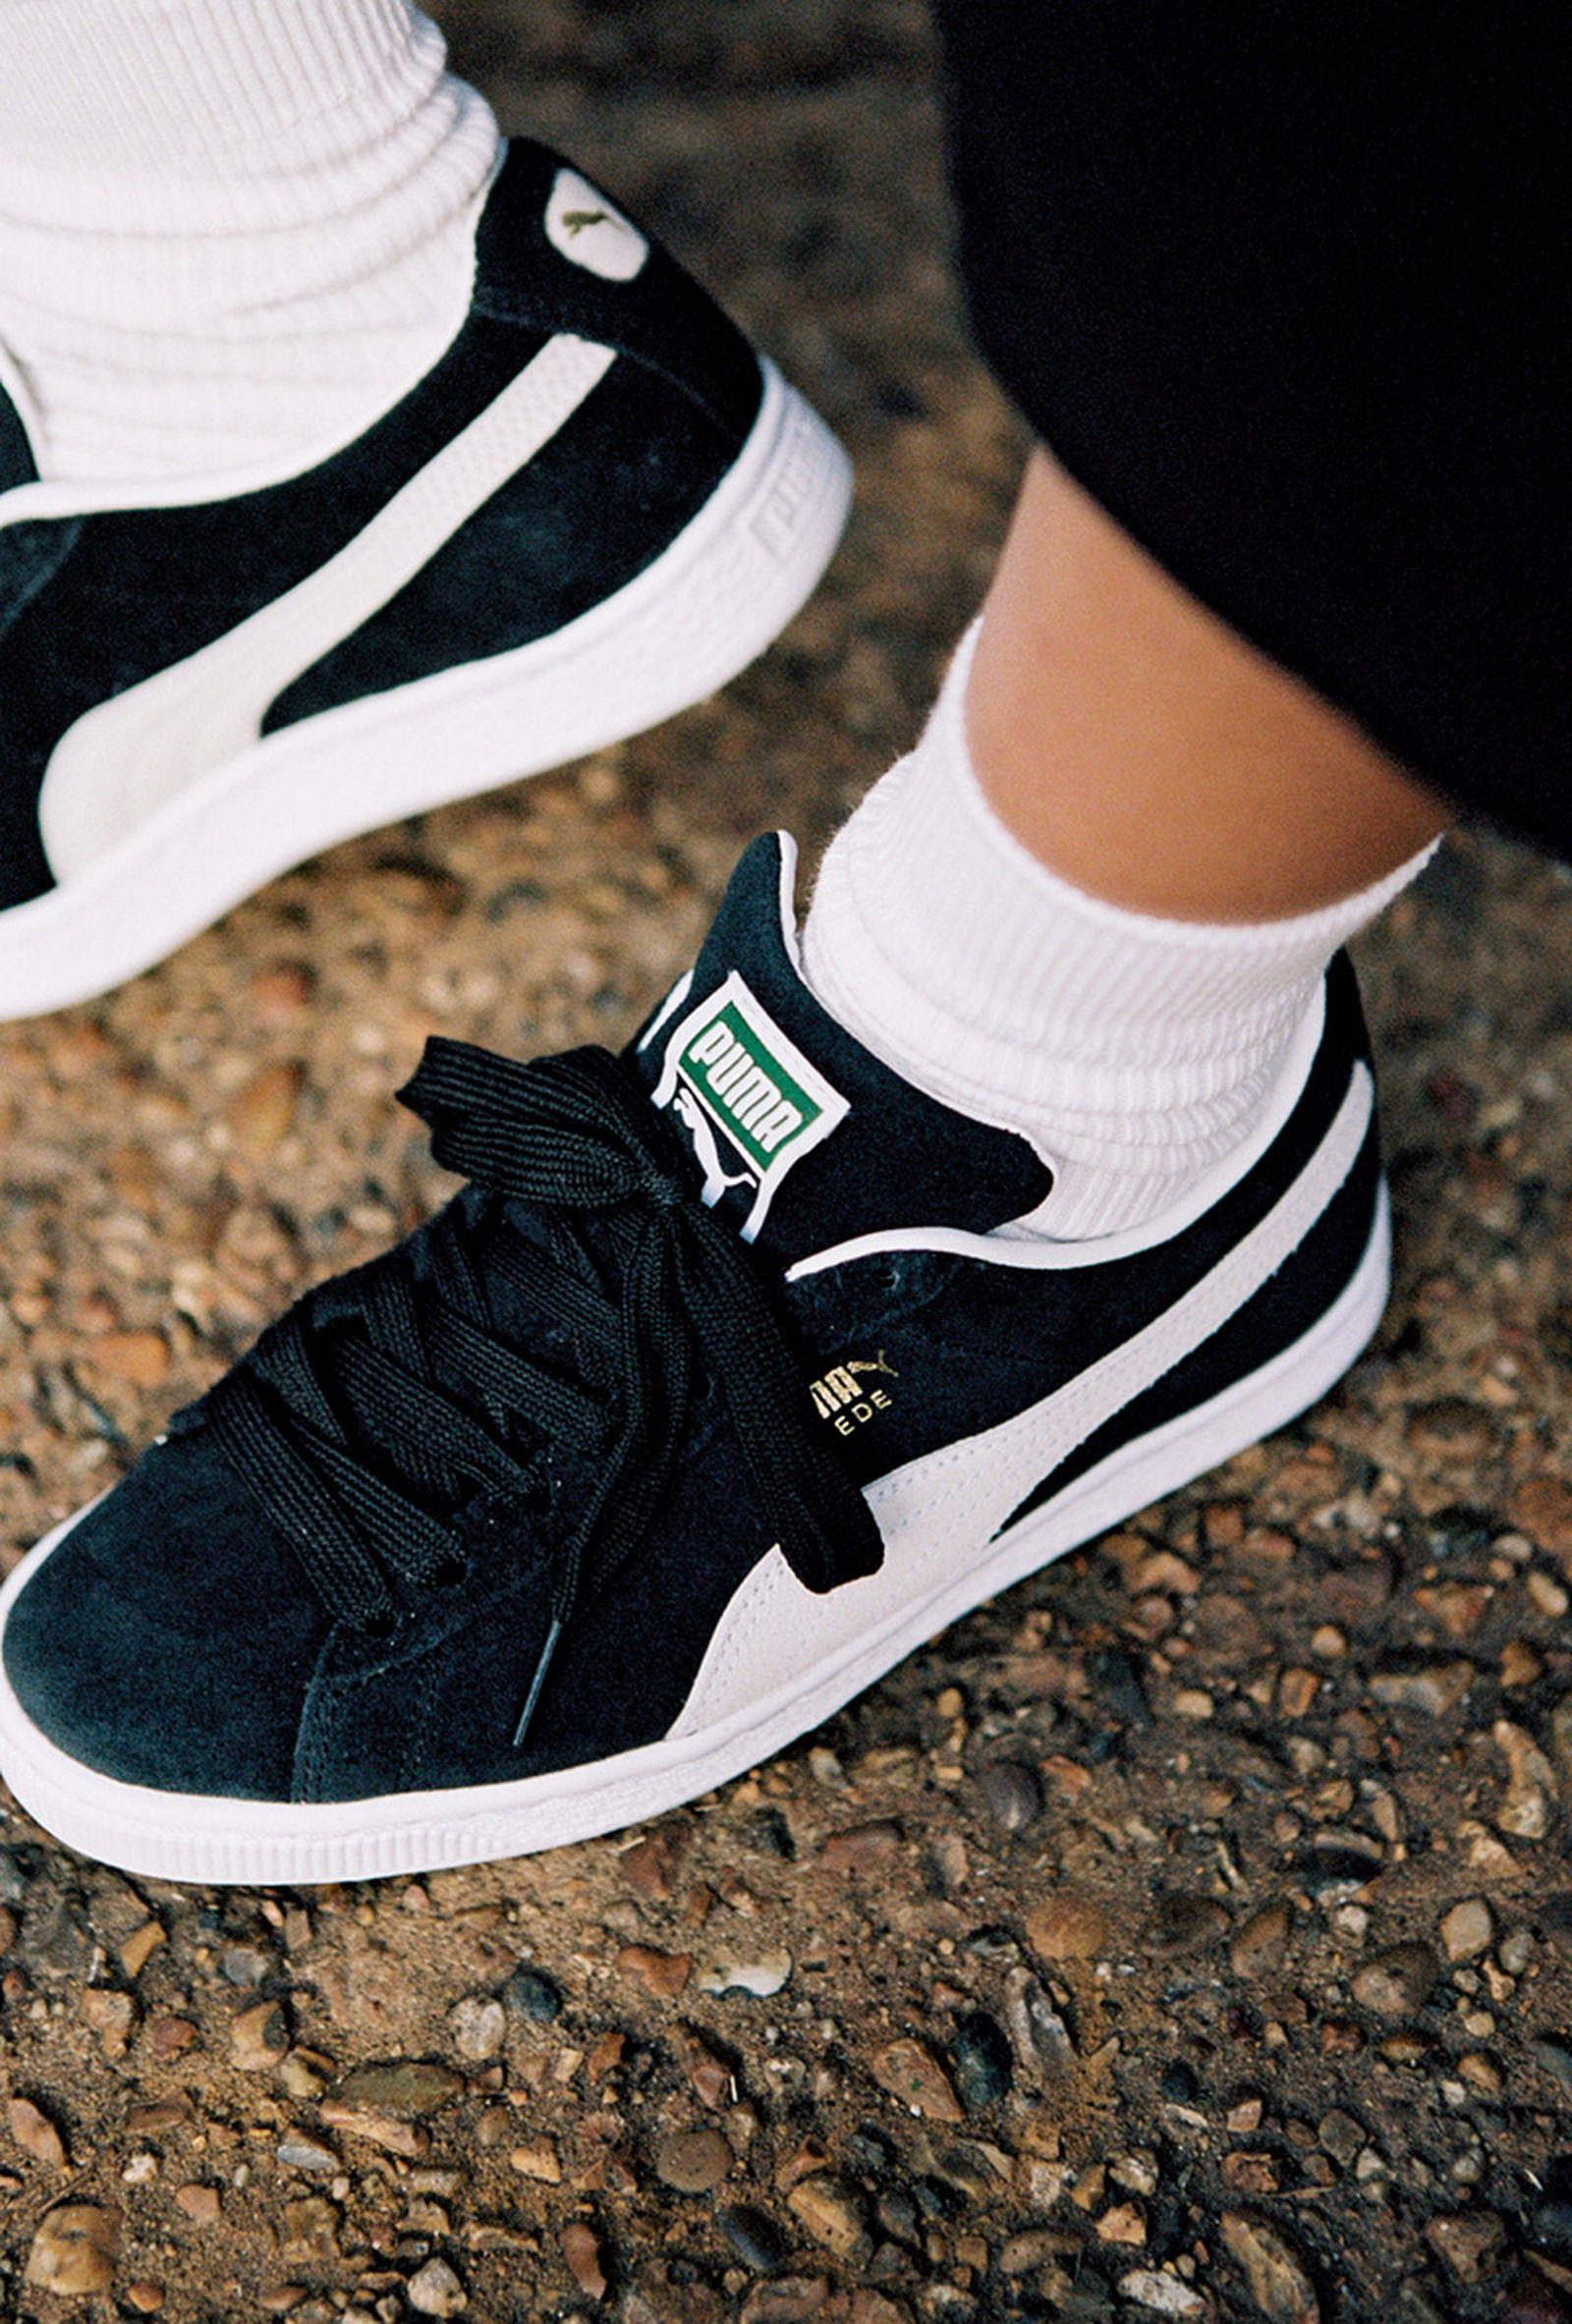 uk-breakers-puma-suede-b-boy-global-dance-sneaker-01